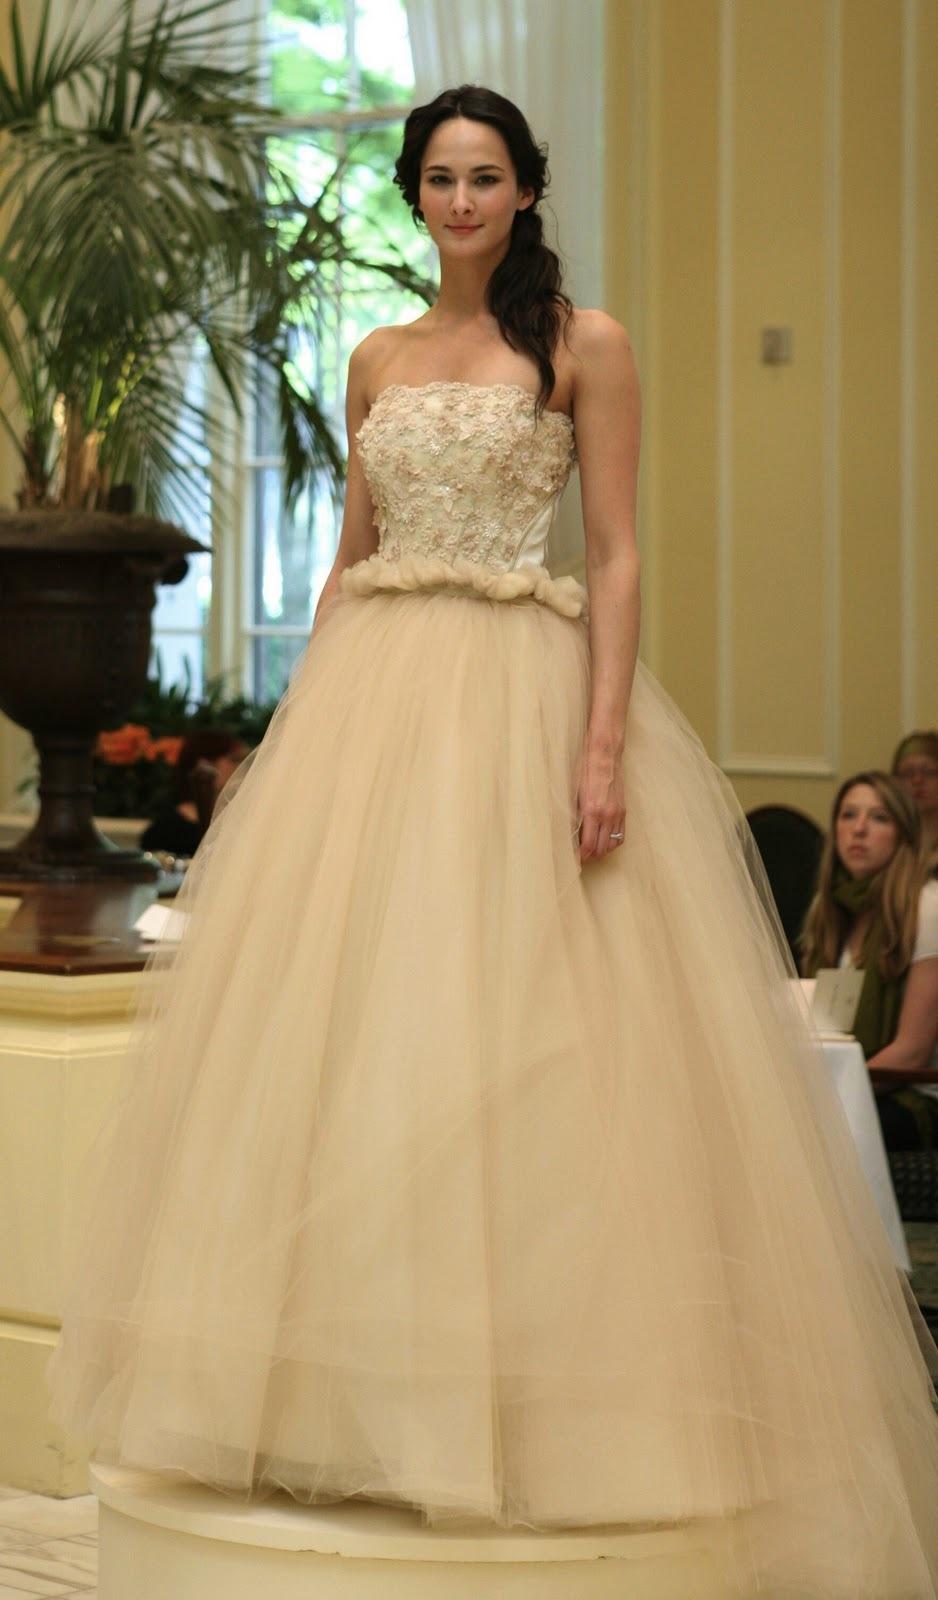 beige romantic tulle ballgown wedding dress beige wedding dress Beige romantic tulle ballgown wedding dress